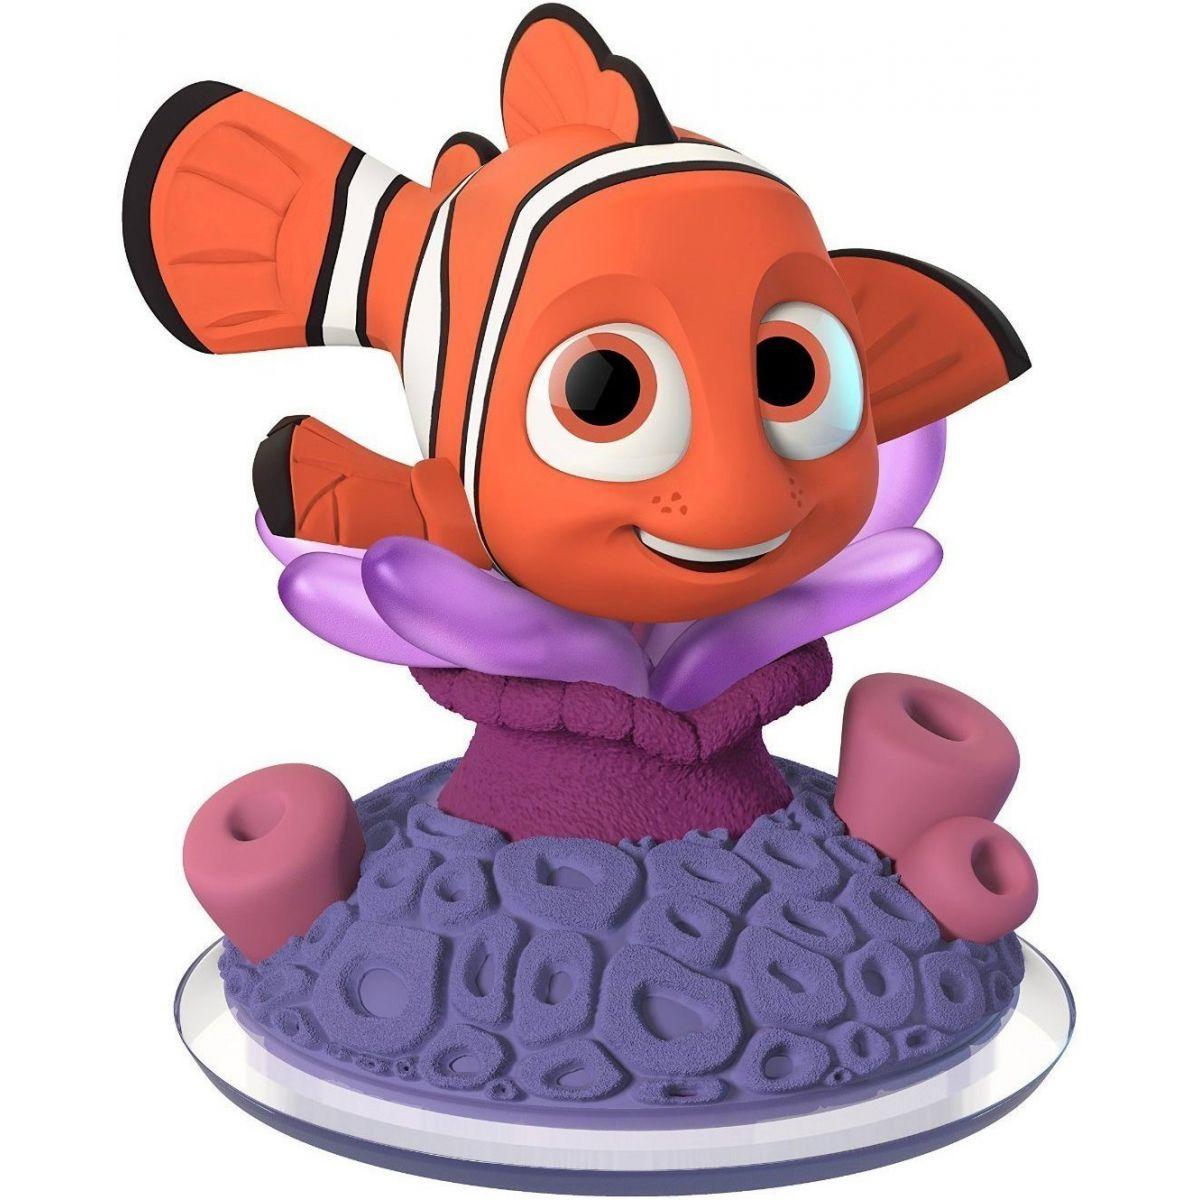 Disney Infinity 3.0 Edition: Nemo Figure com 2 Power discs  - Movie Freaks Collectibles